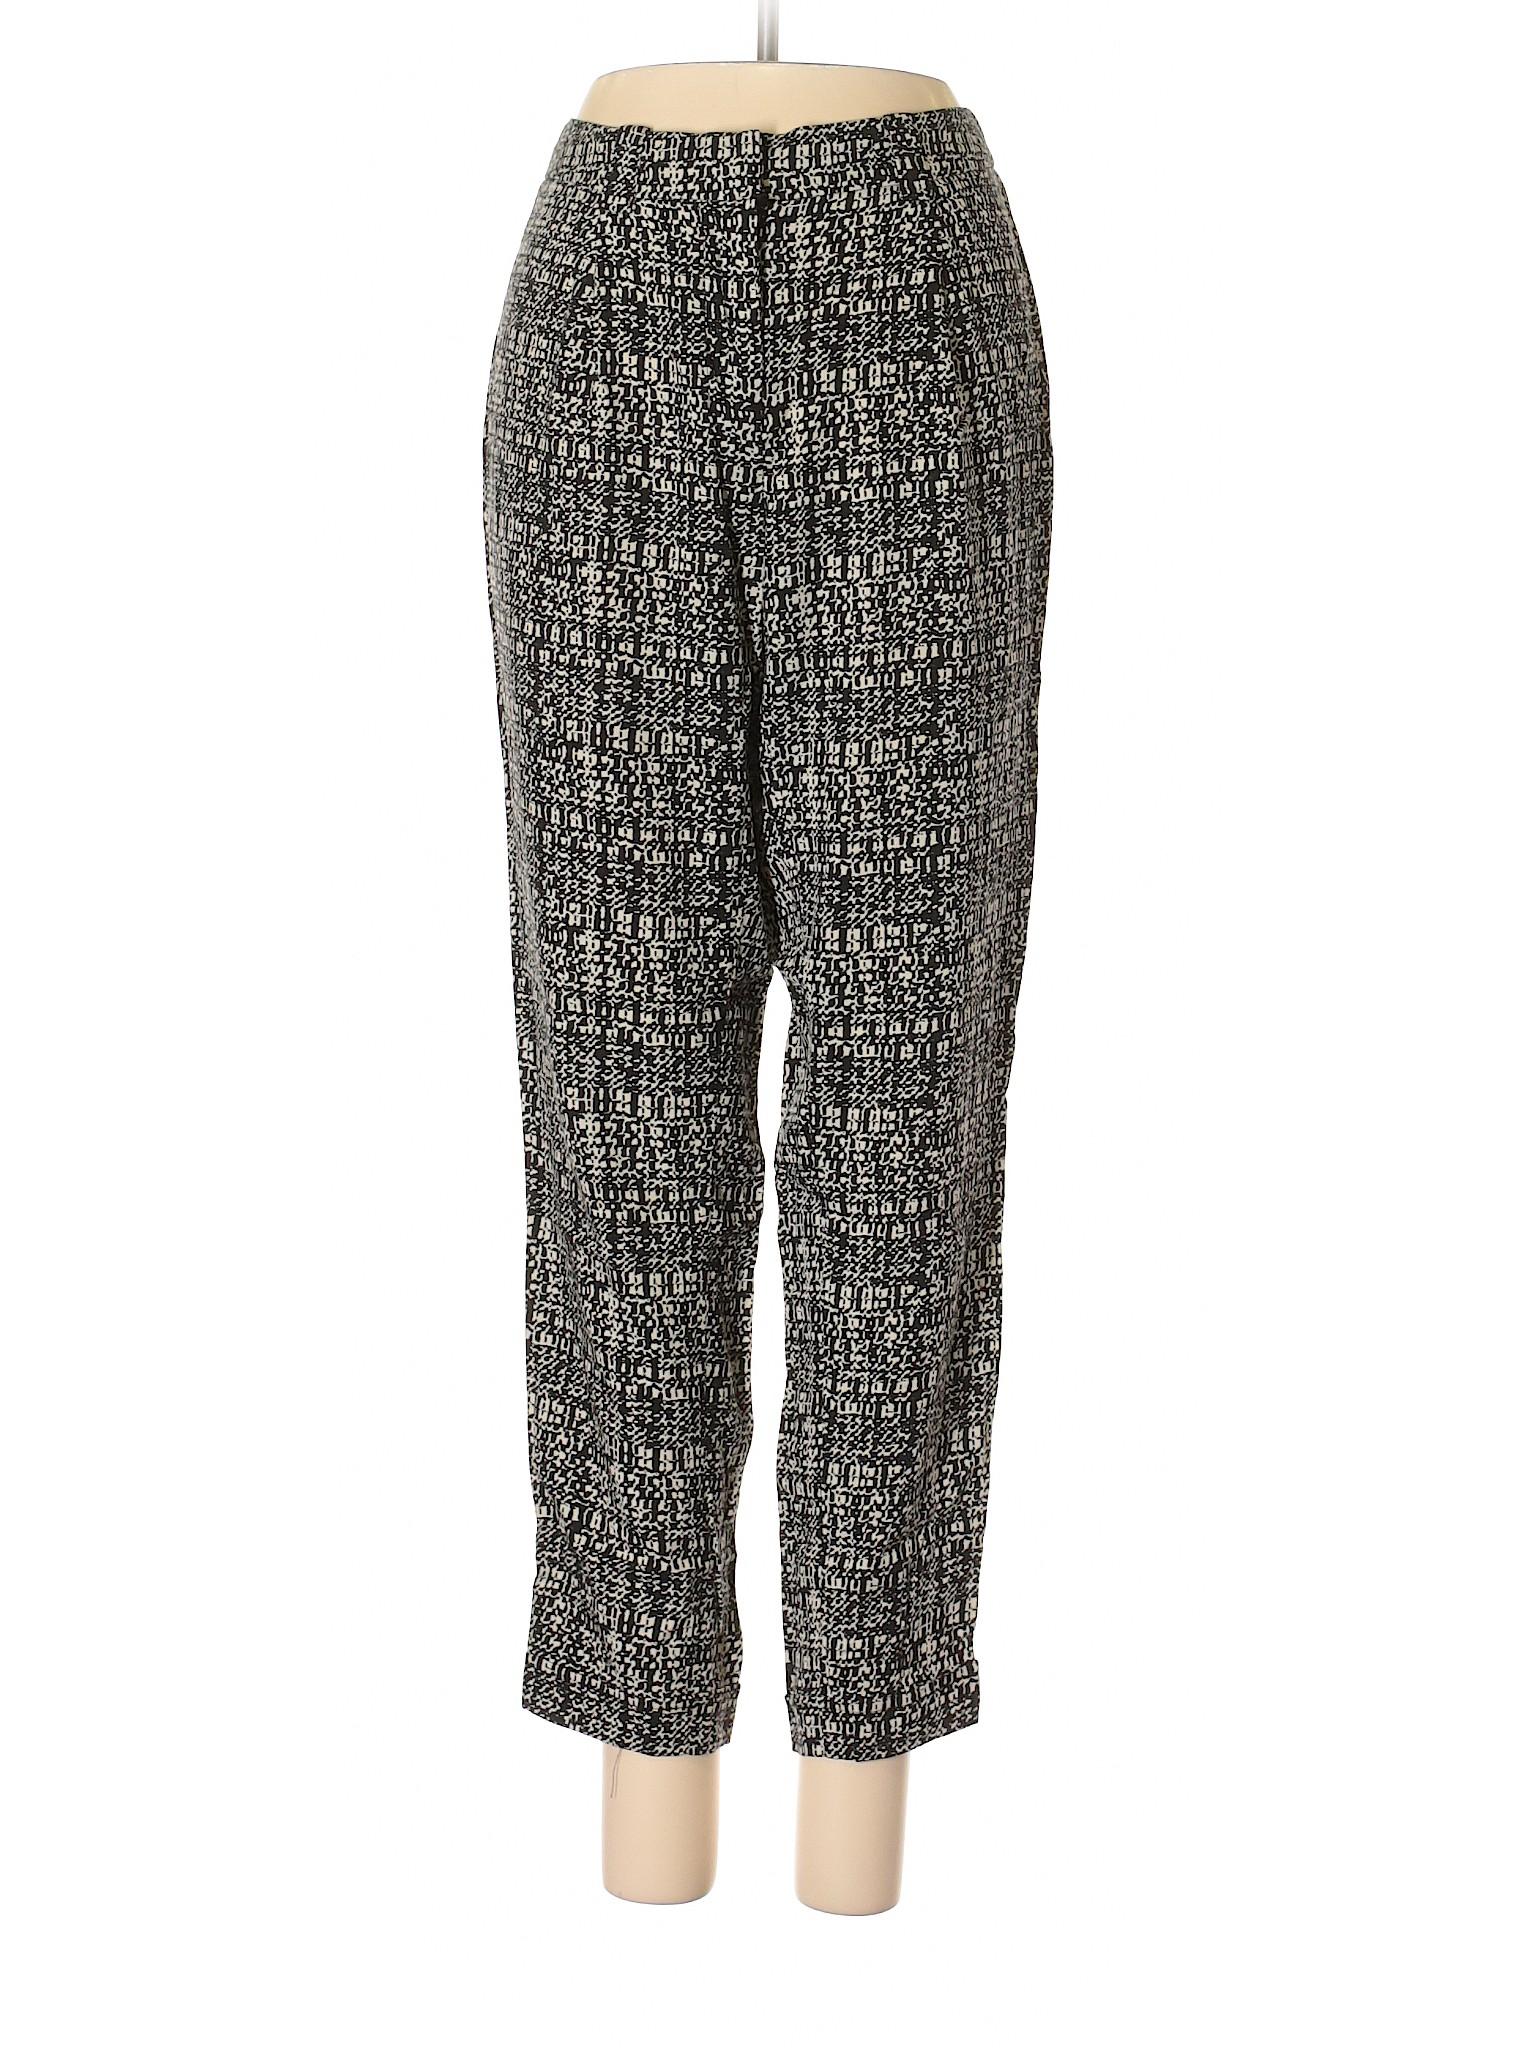 Pants Leisure winter Platinum Casual ABS pwwxXqIZT